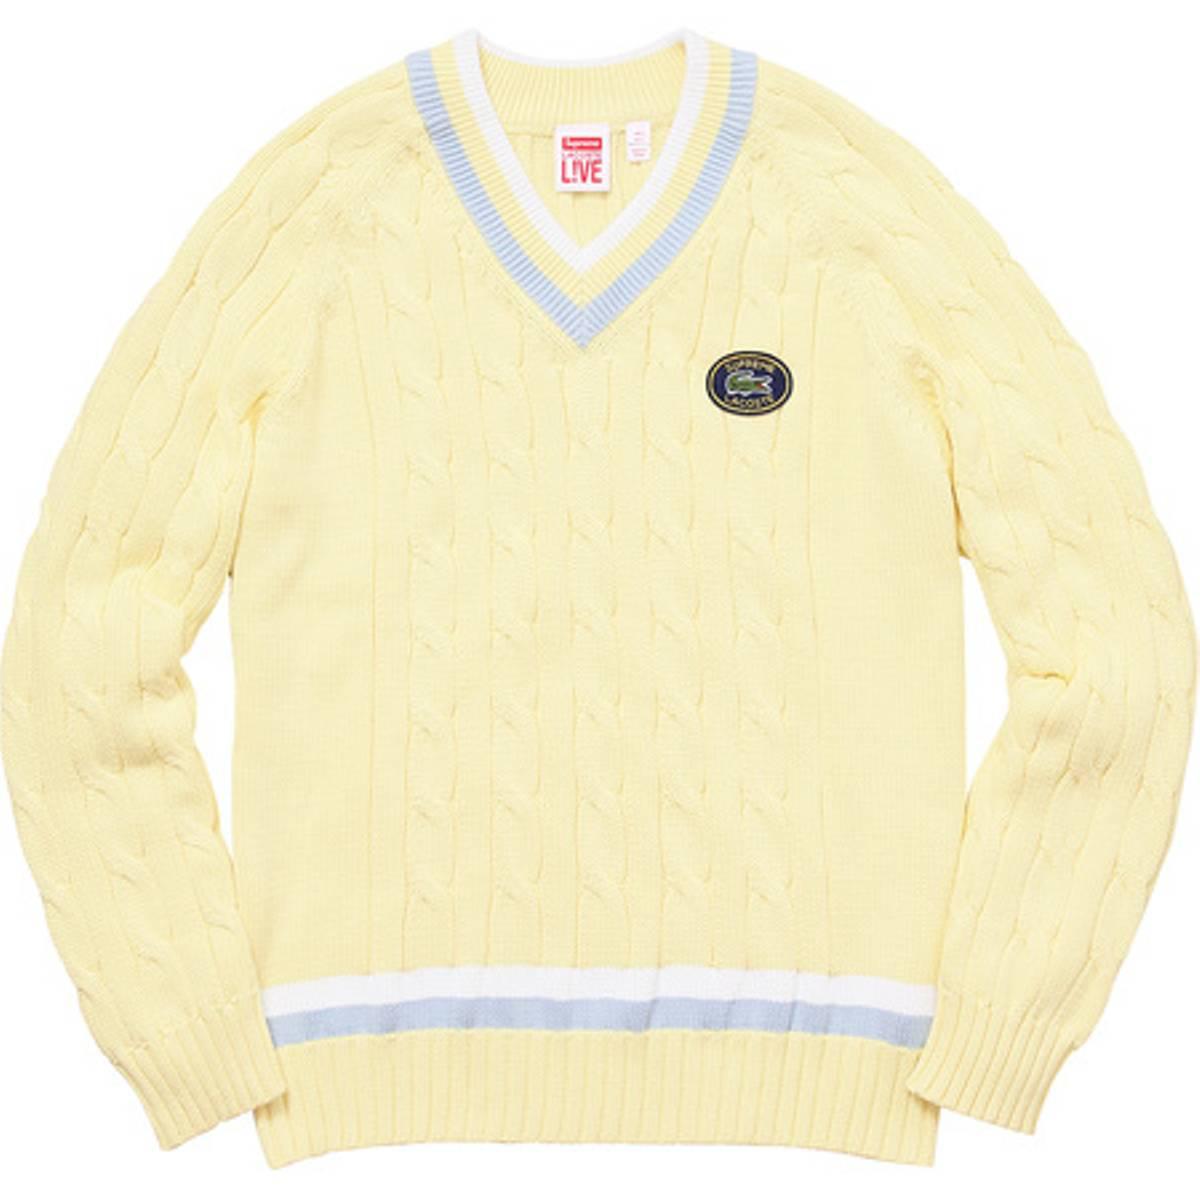 acc84b24c484e Supreme - Yellow Lacoste Tennis Sweater for Men - Lyst. View fullscreen